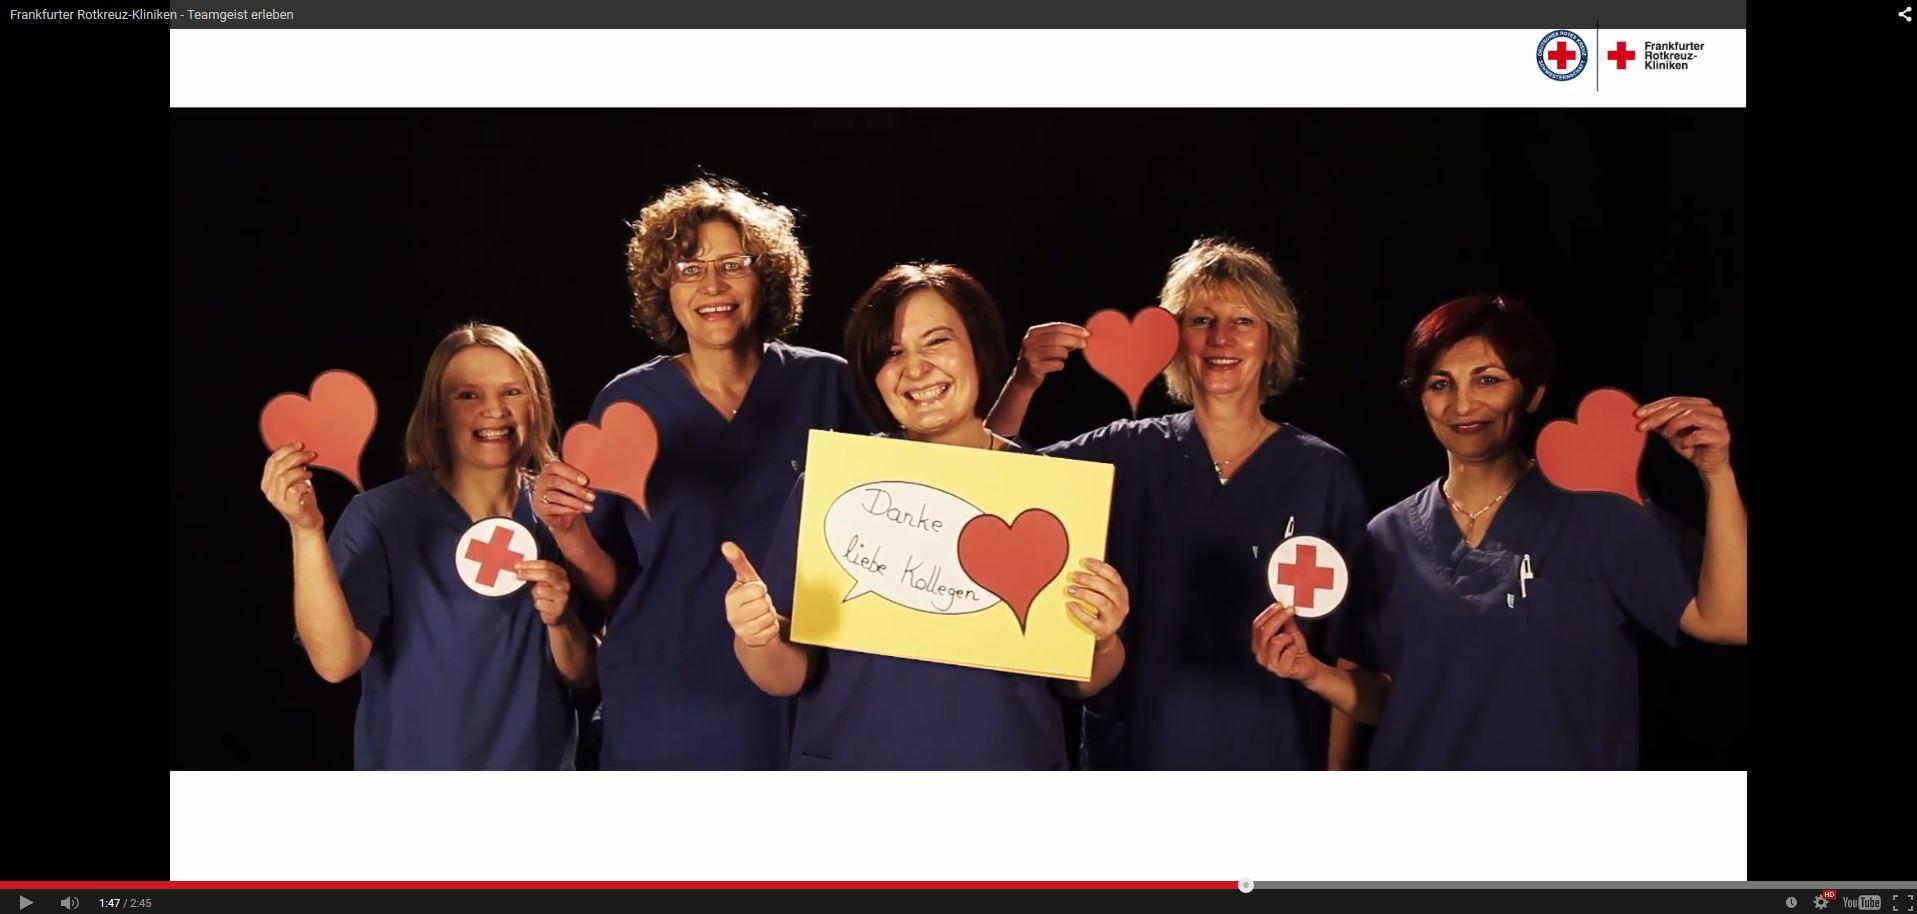 Imagevideo der Rotkreuz-Kliniken